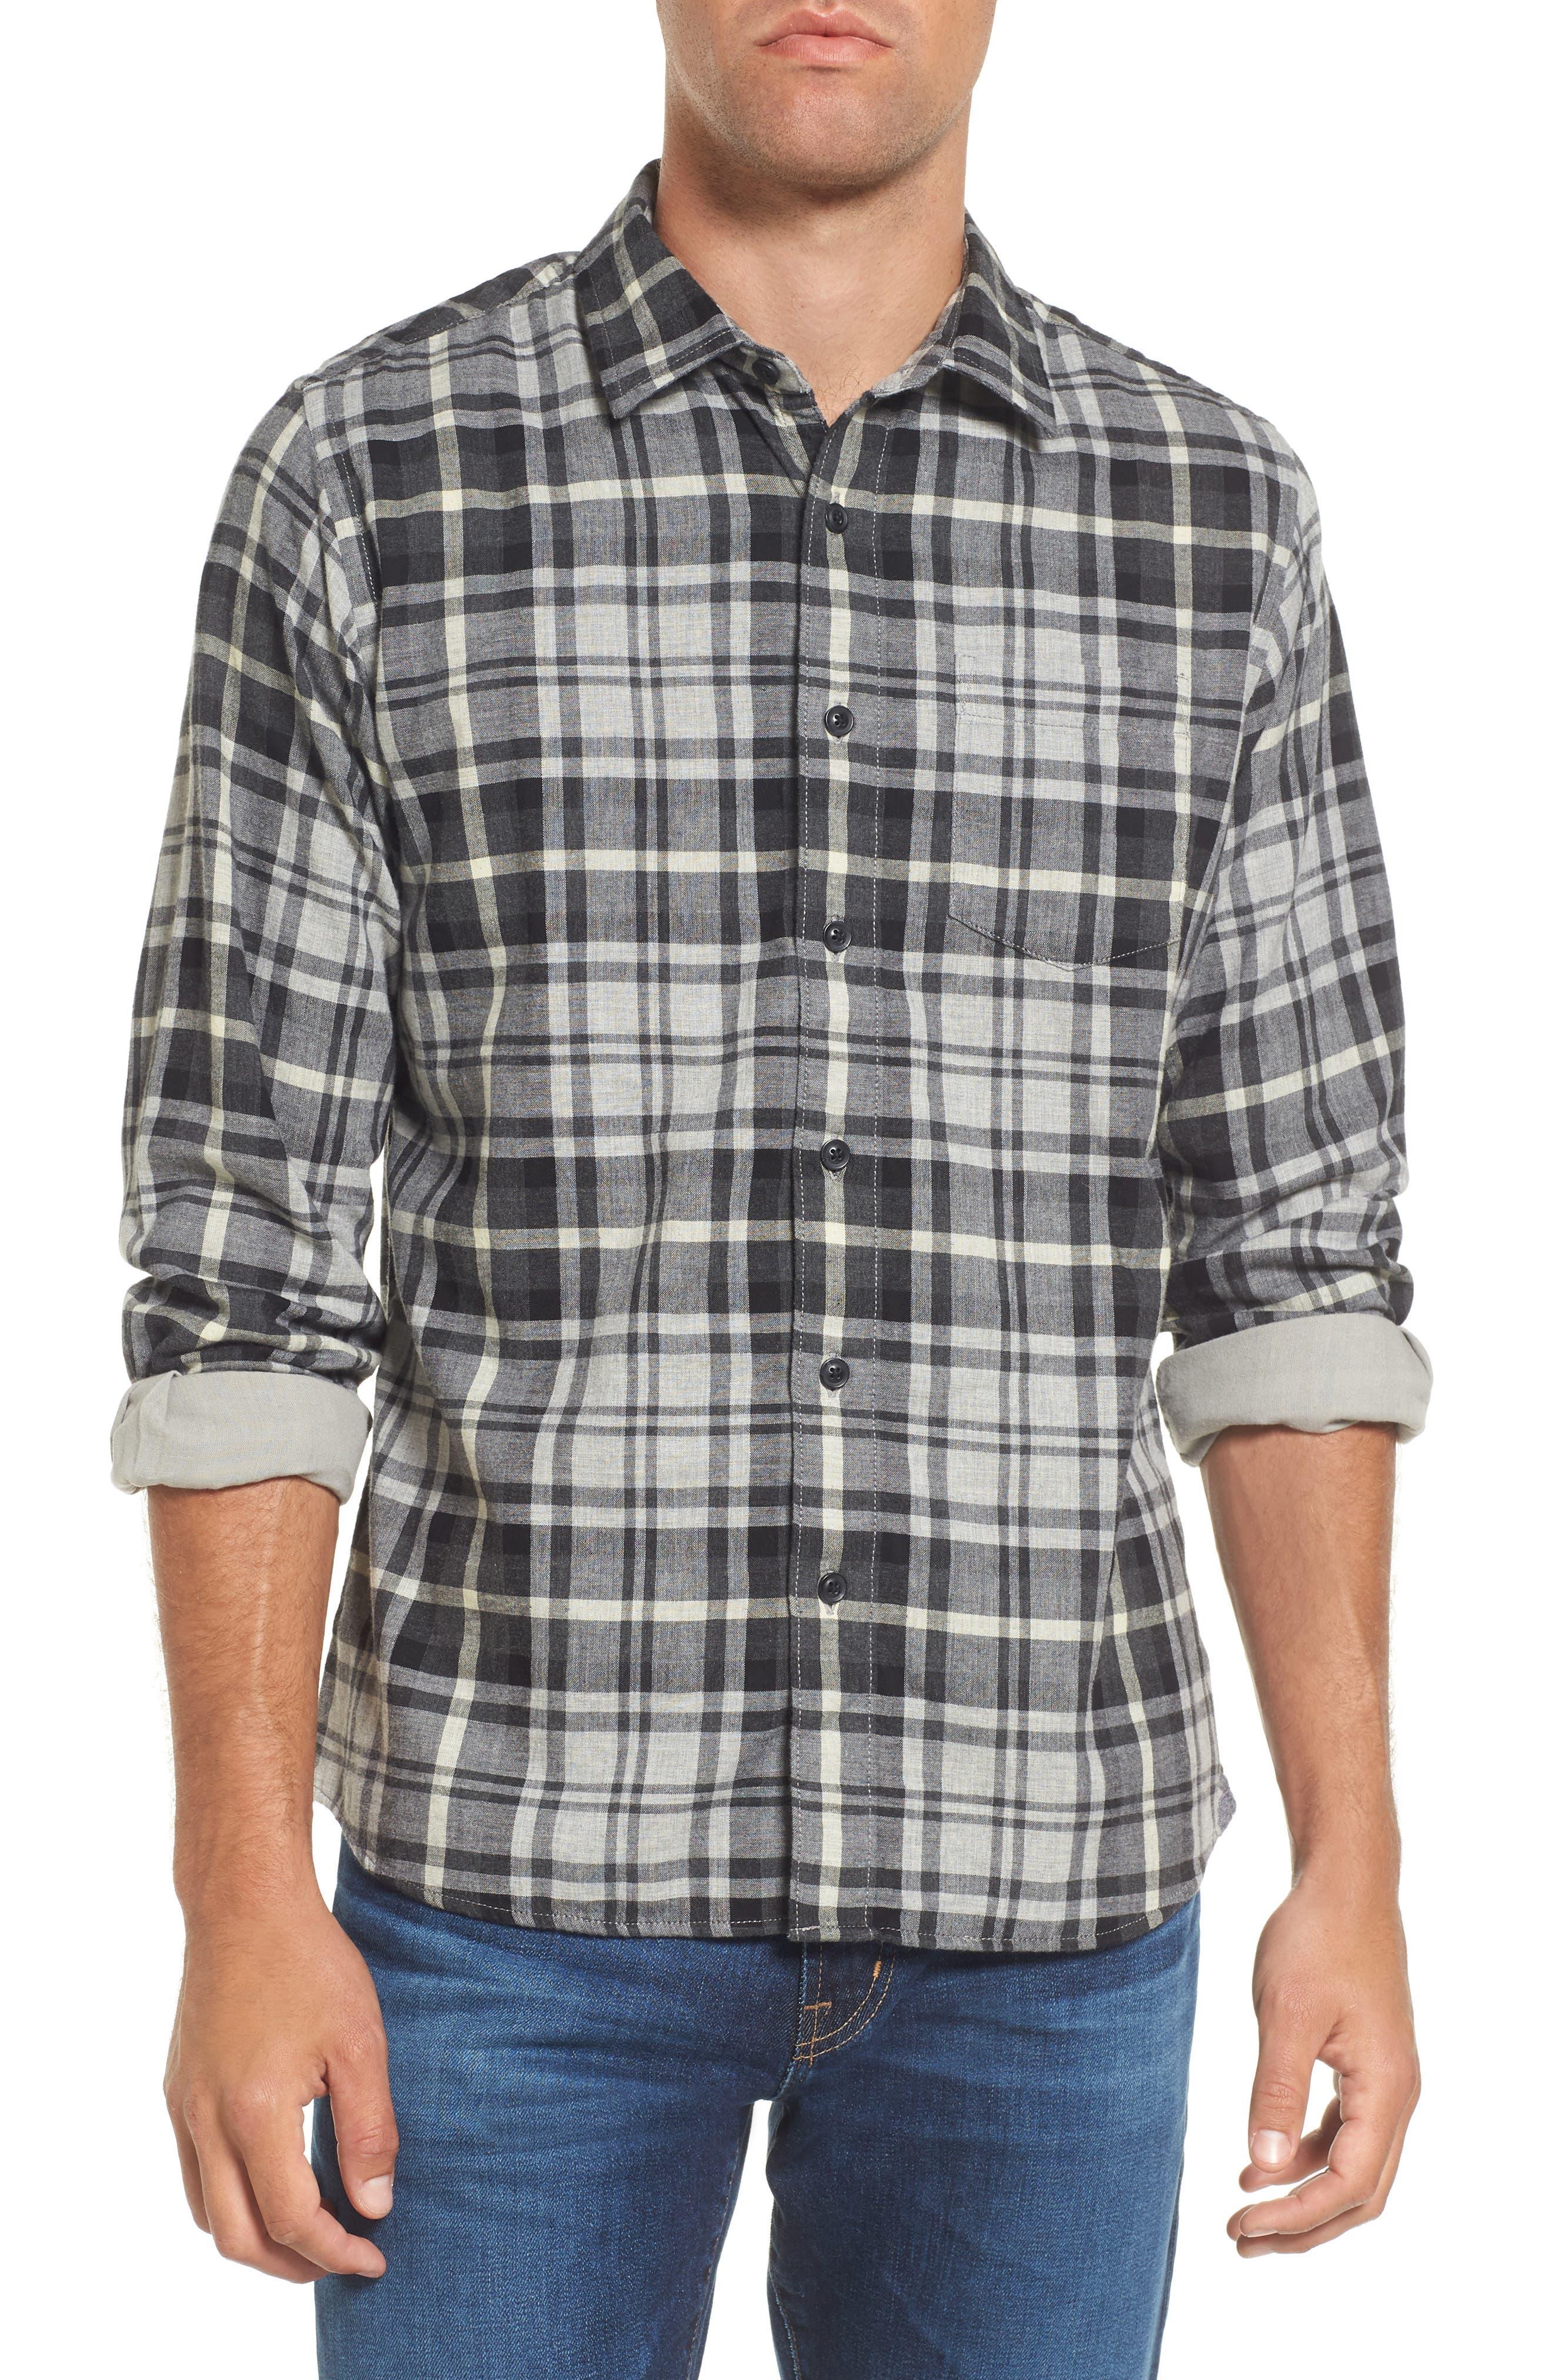 Heath Modern Fit Plaid Double Cloth Sport Shirt,                         Main,                         color, Charcoal Gray